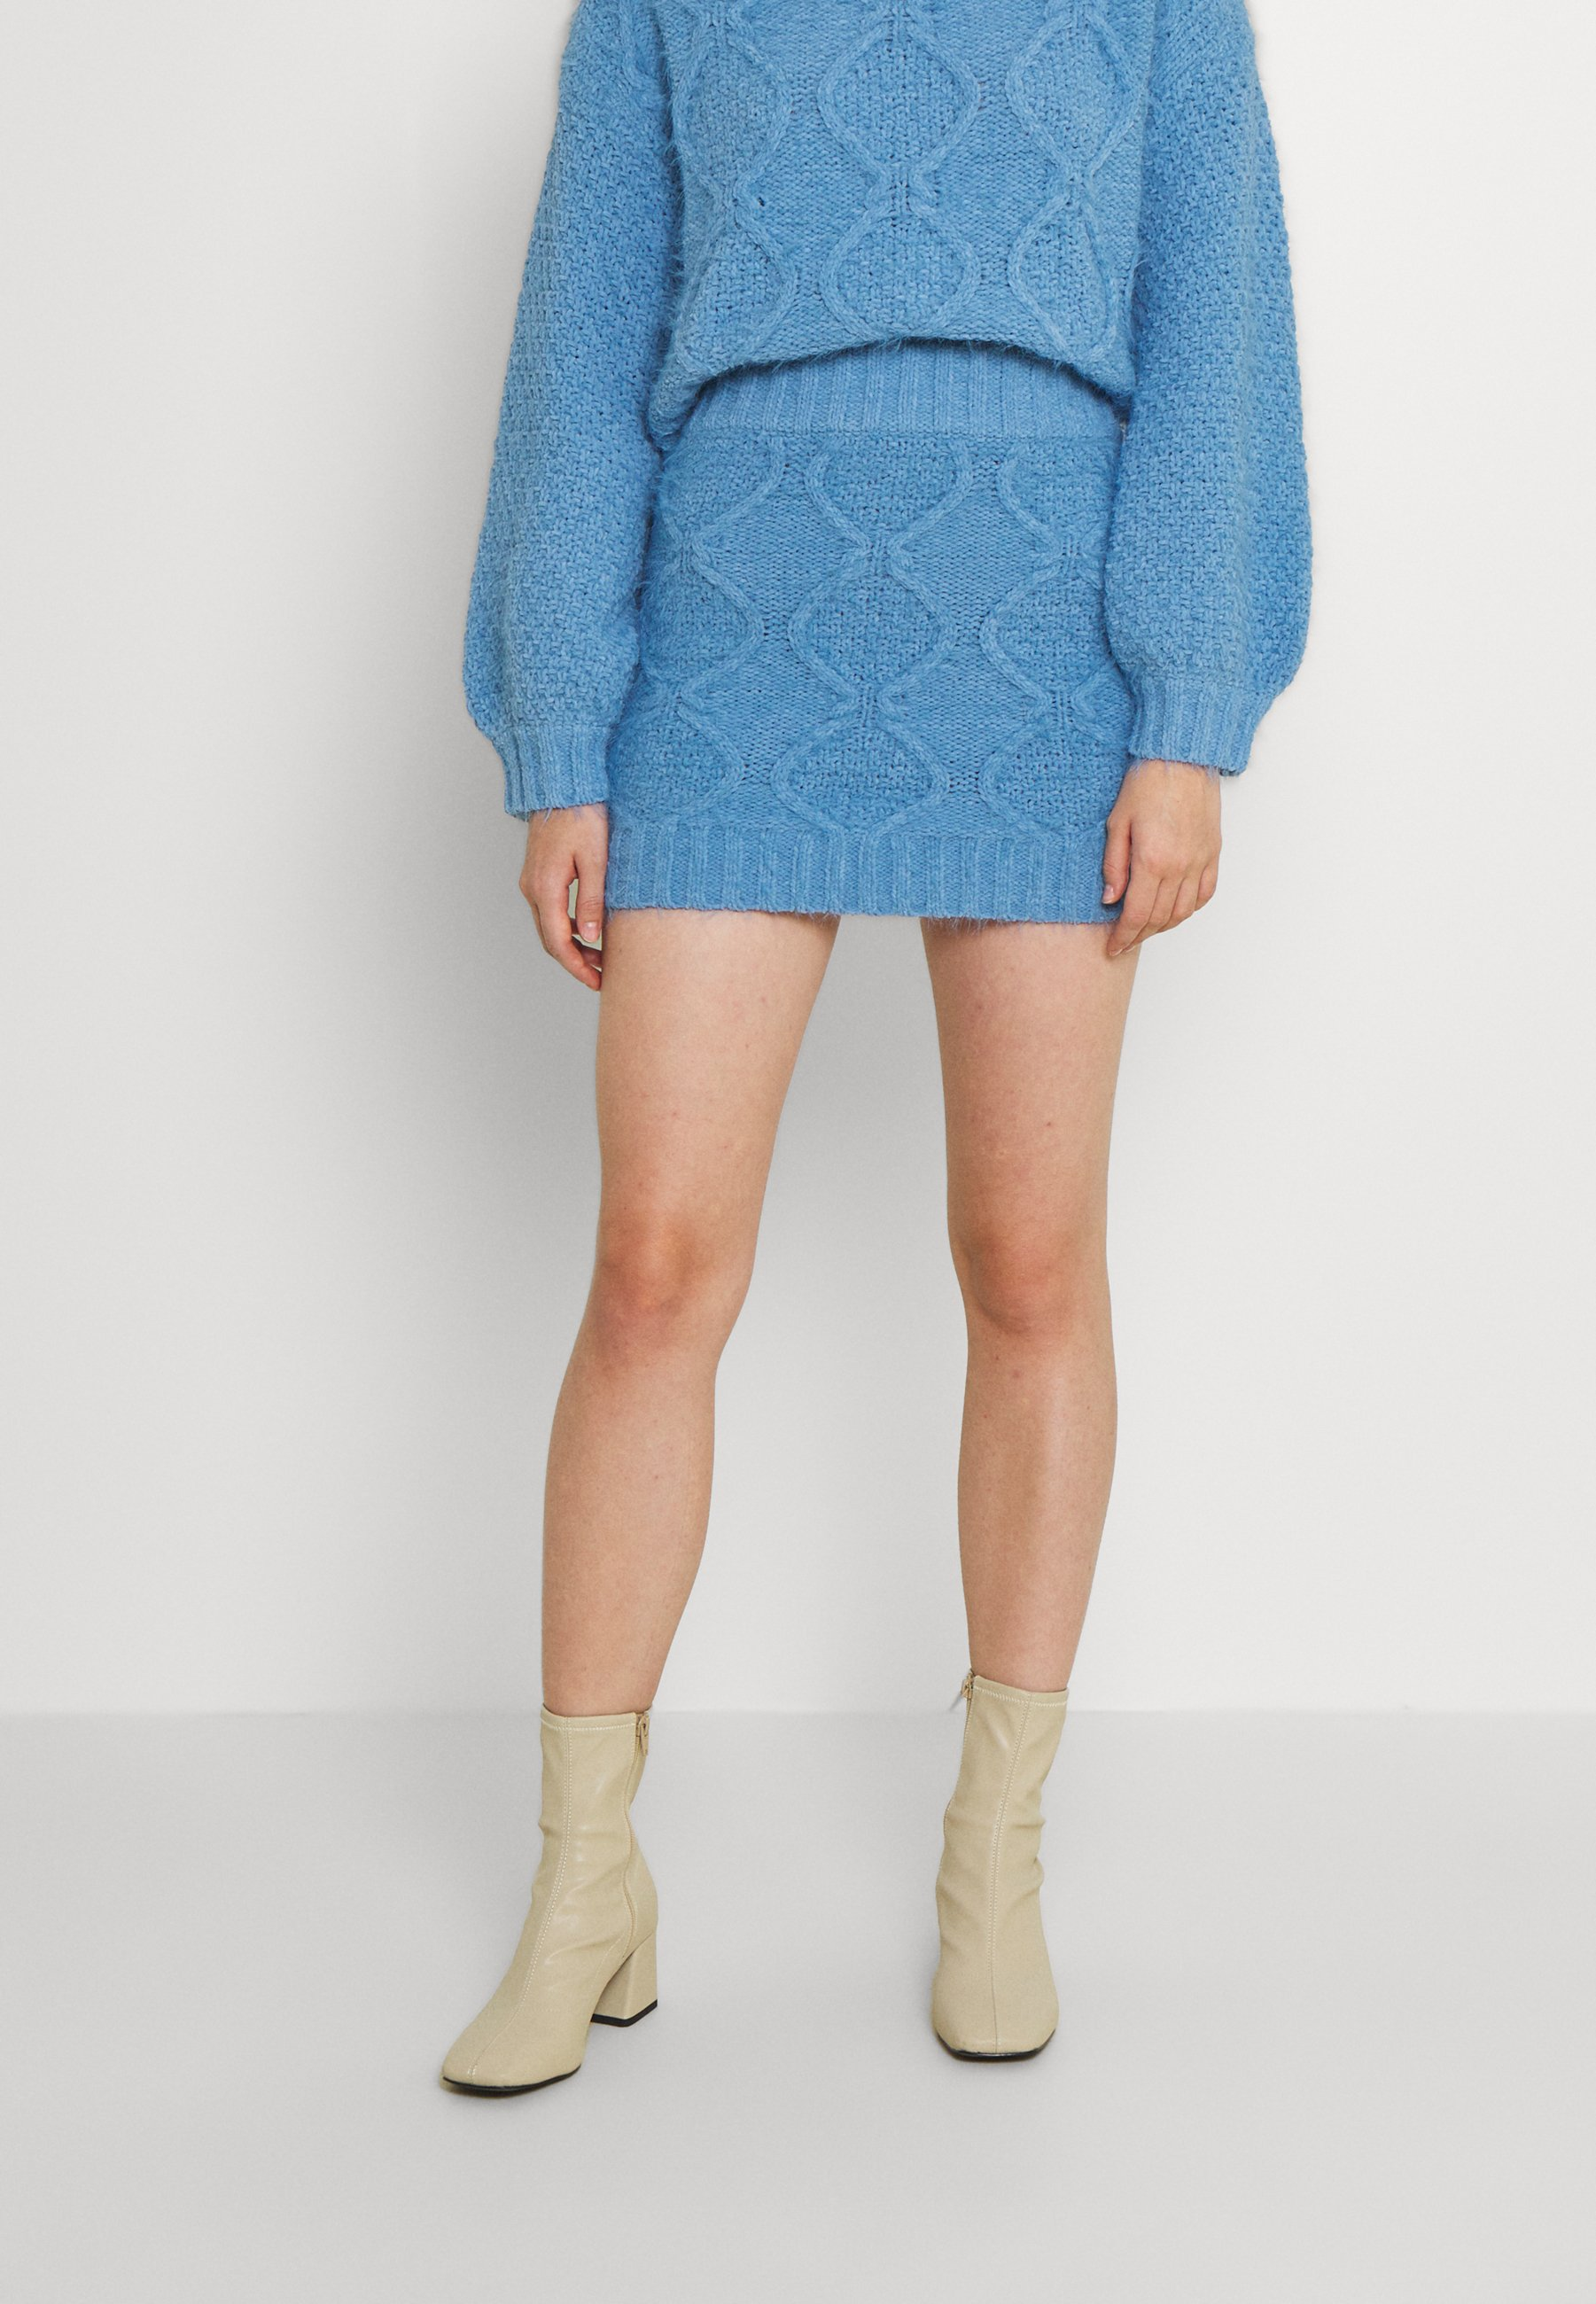 Femme CABLE SKIRT - Minijupe